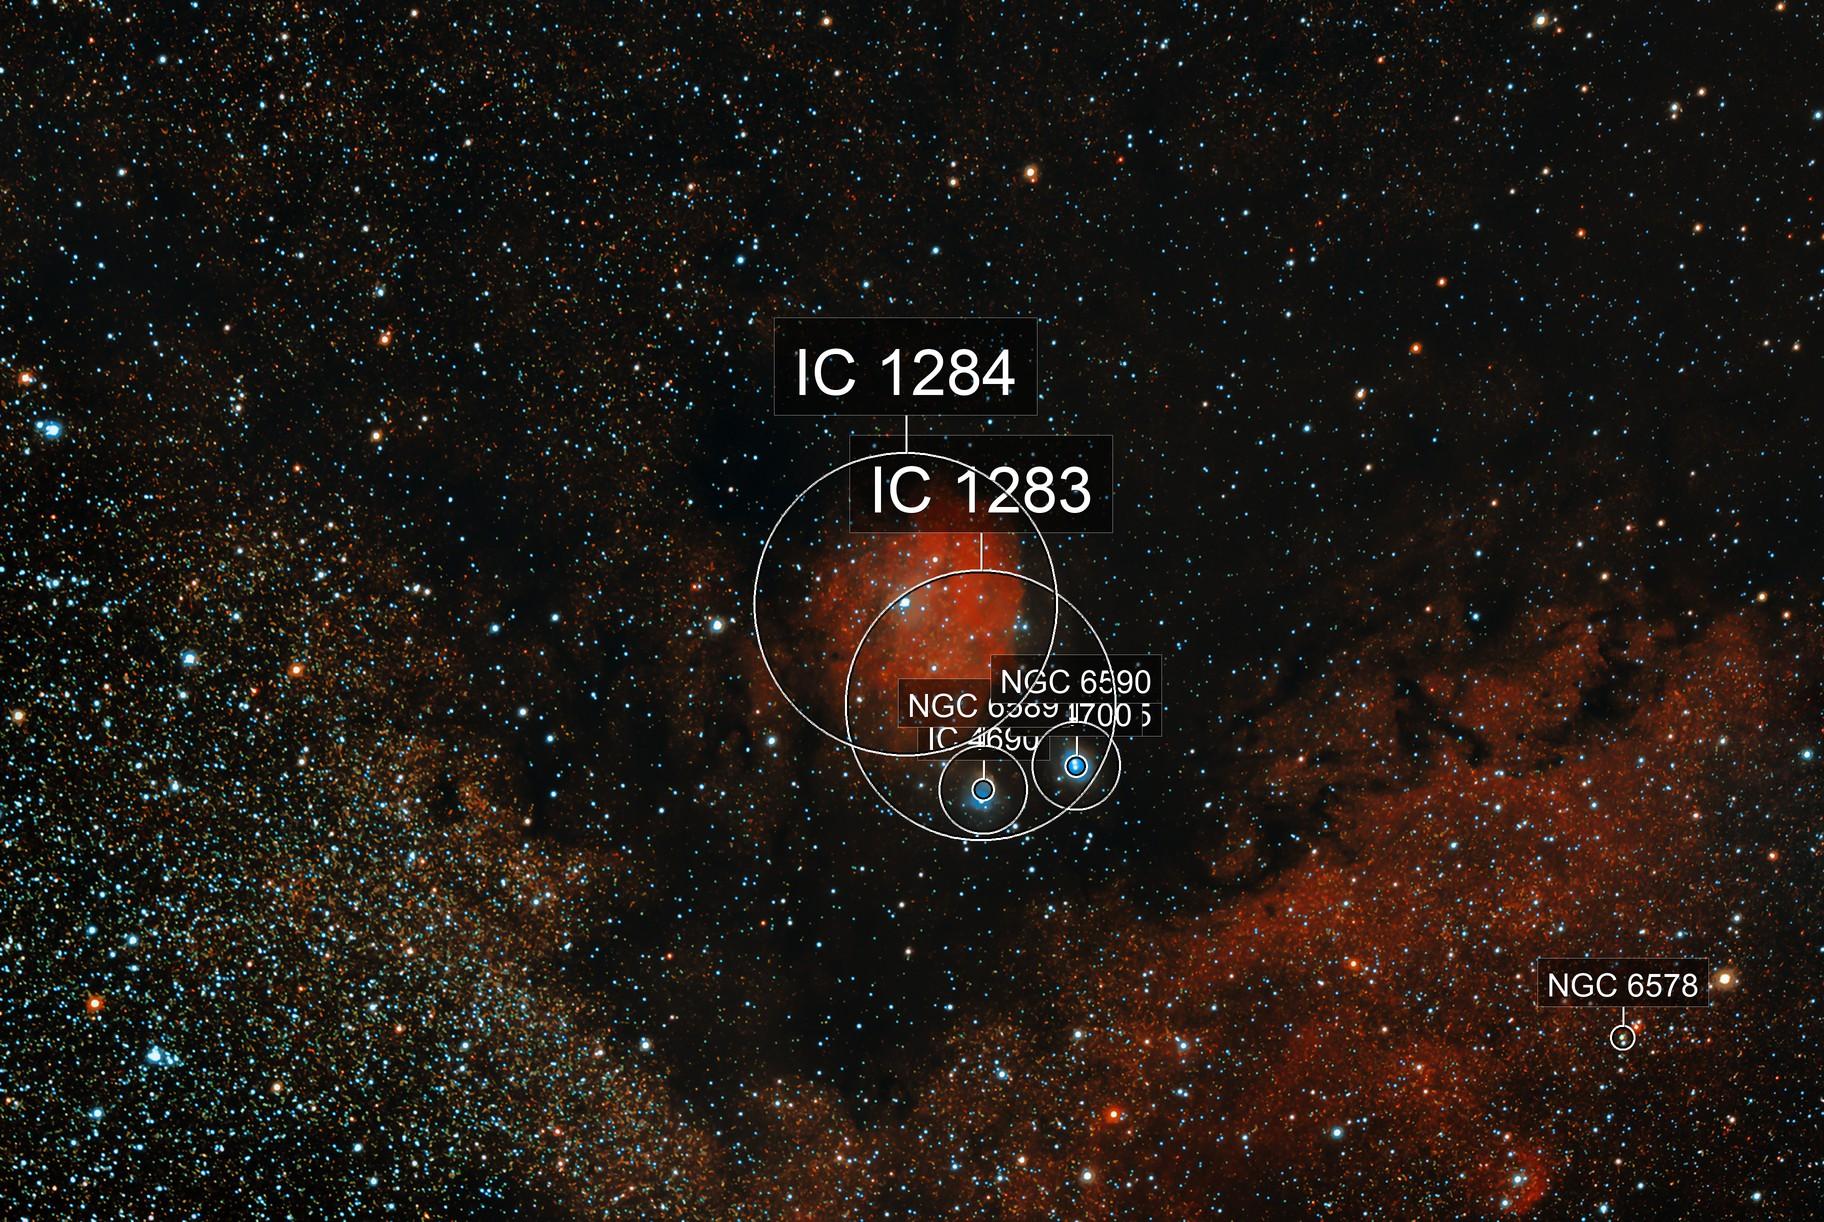 IC 1284